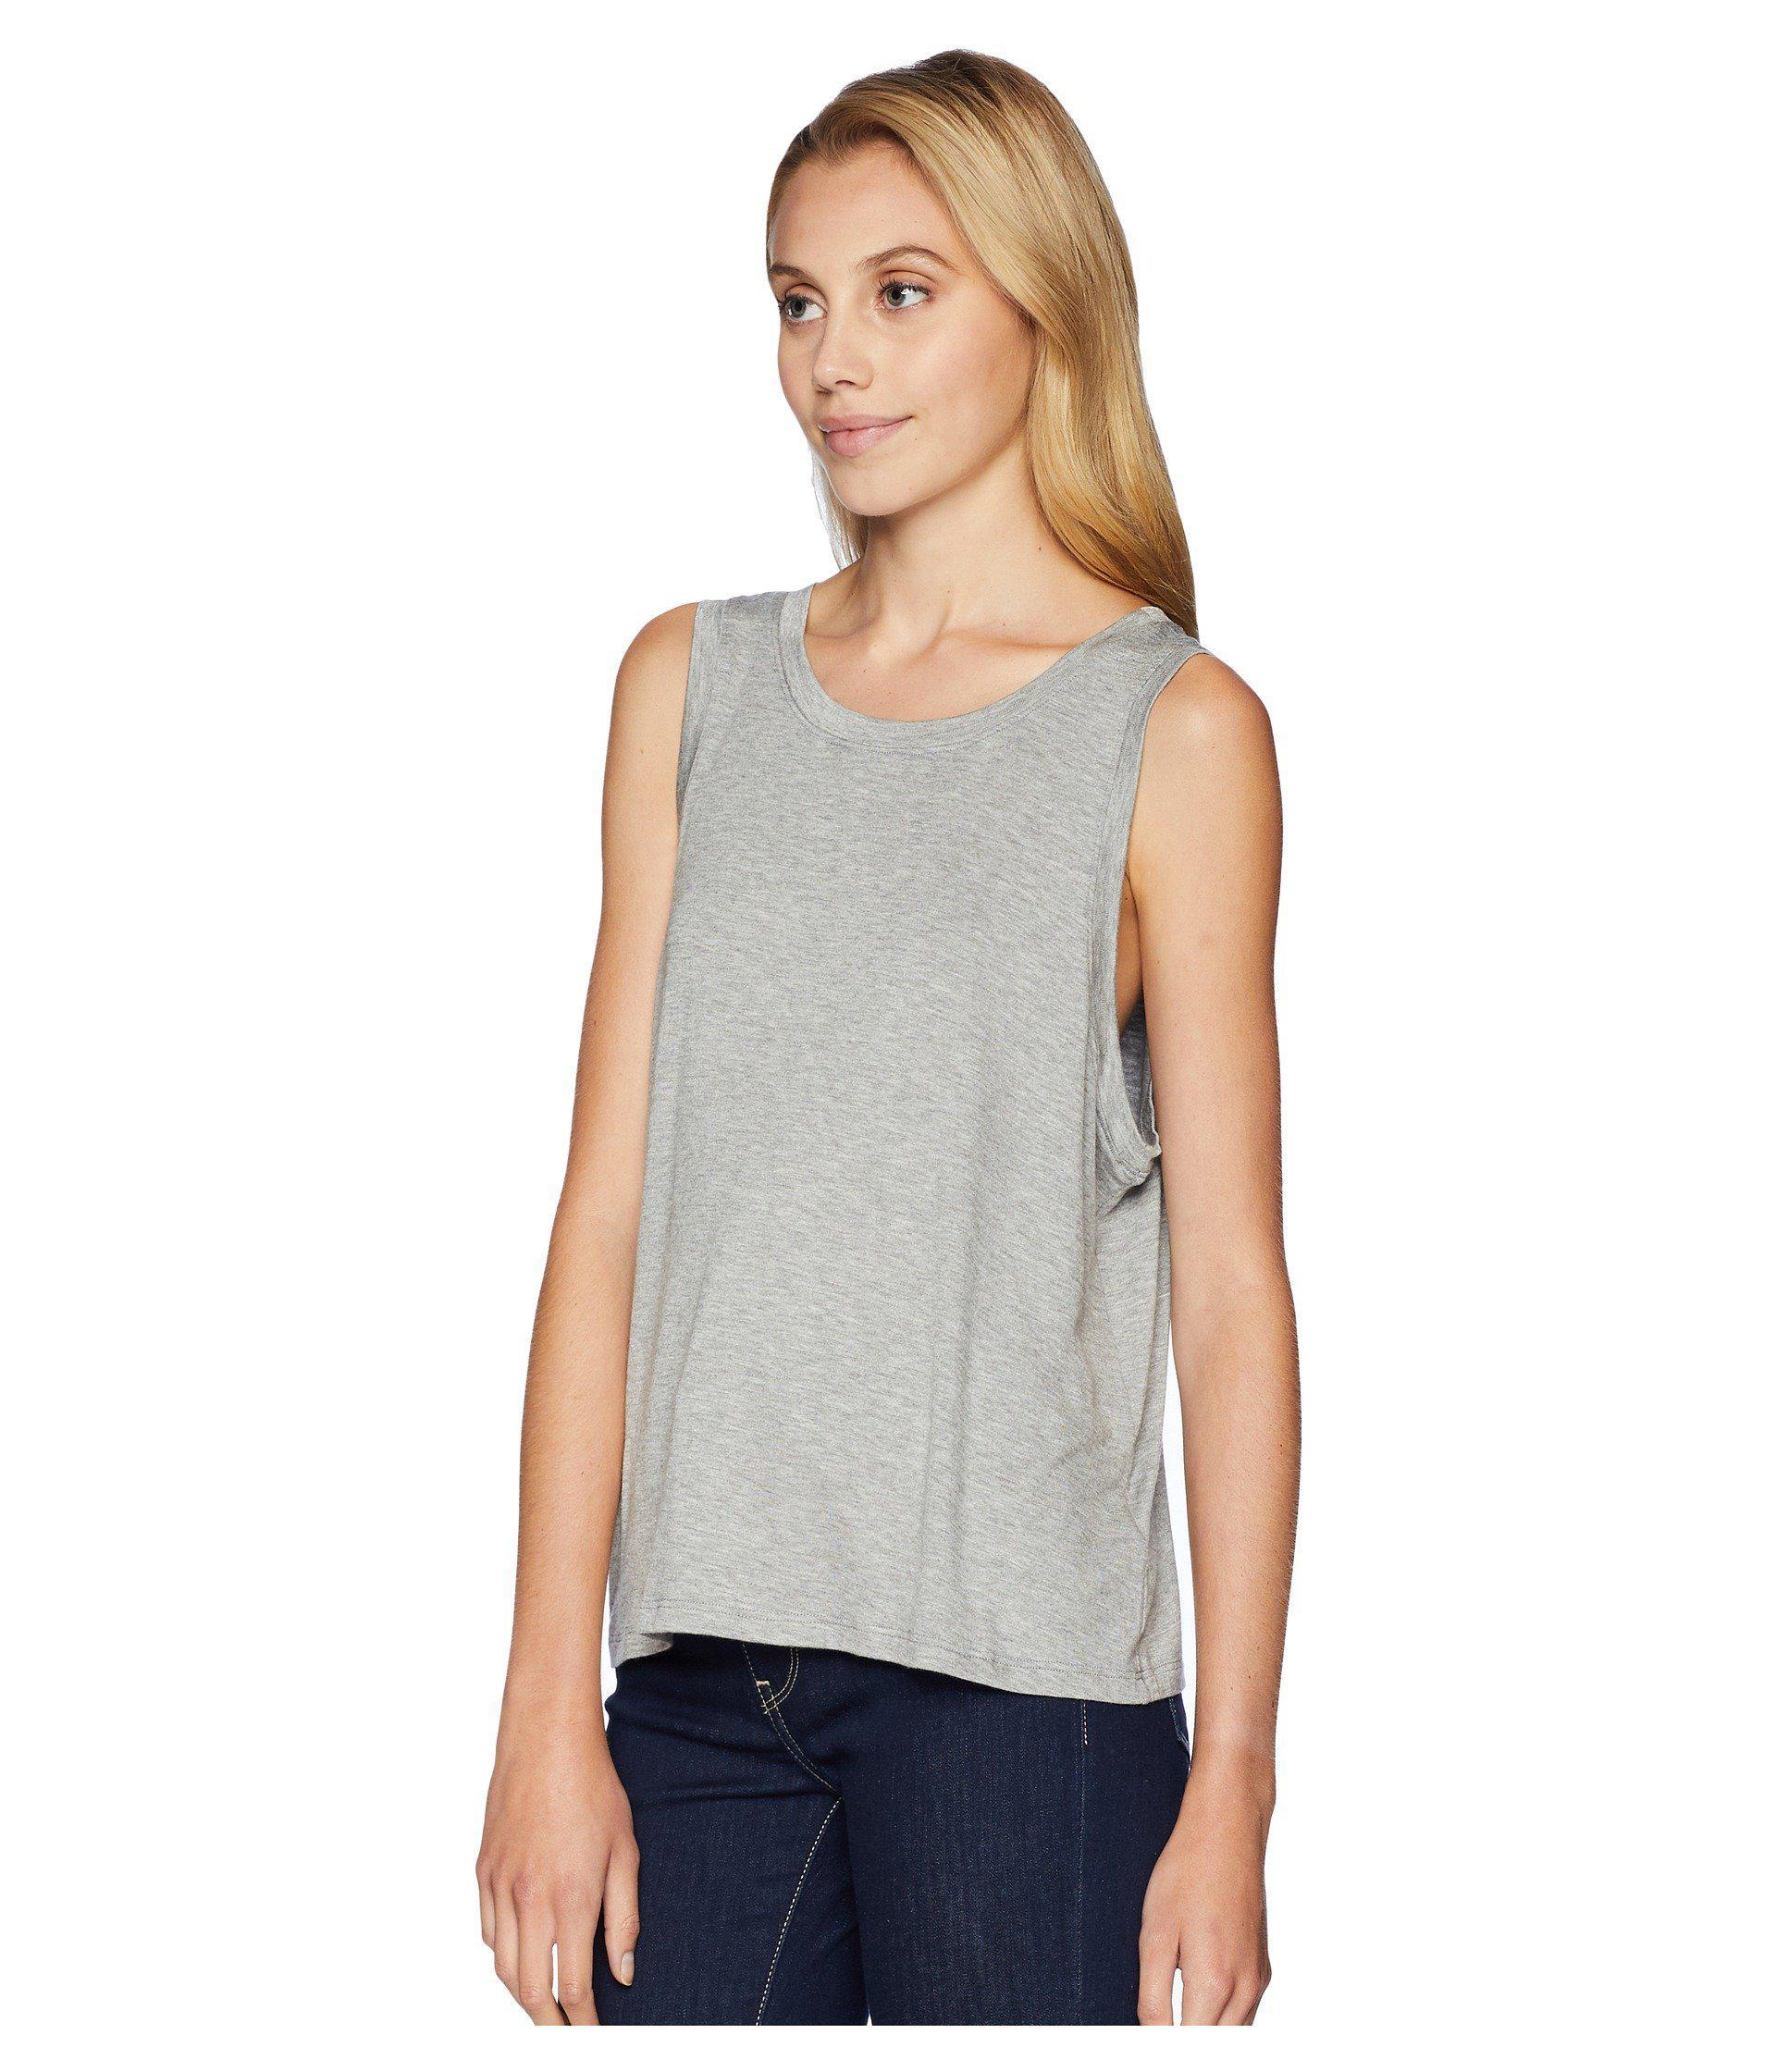 5ac0b3d63 Lyst - Beyond Yoga Balanced Muscle Tank Top (white) Women's Sleeveless in  Gray